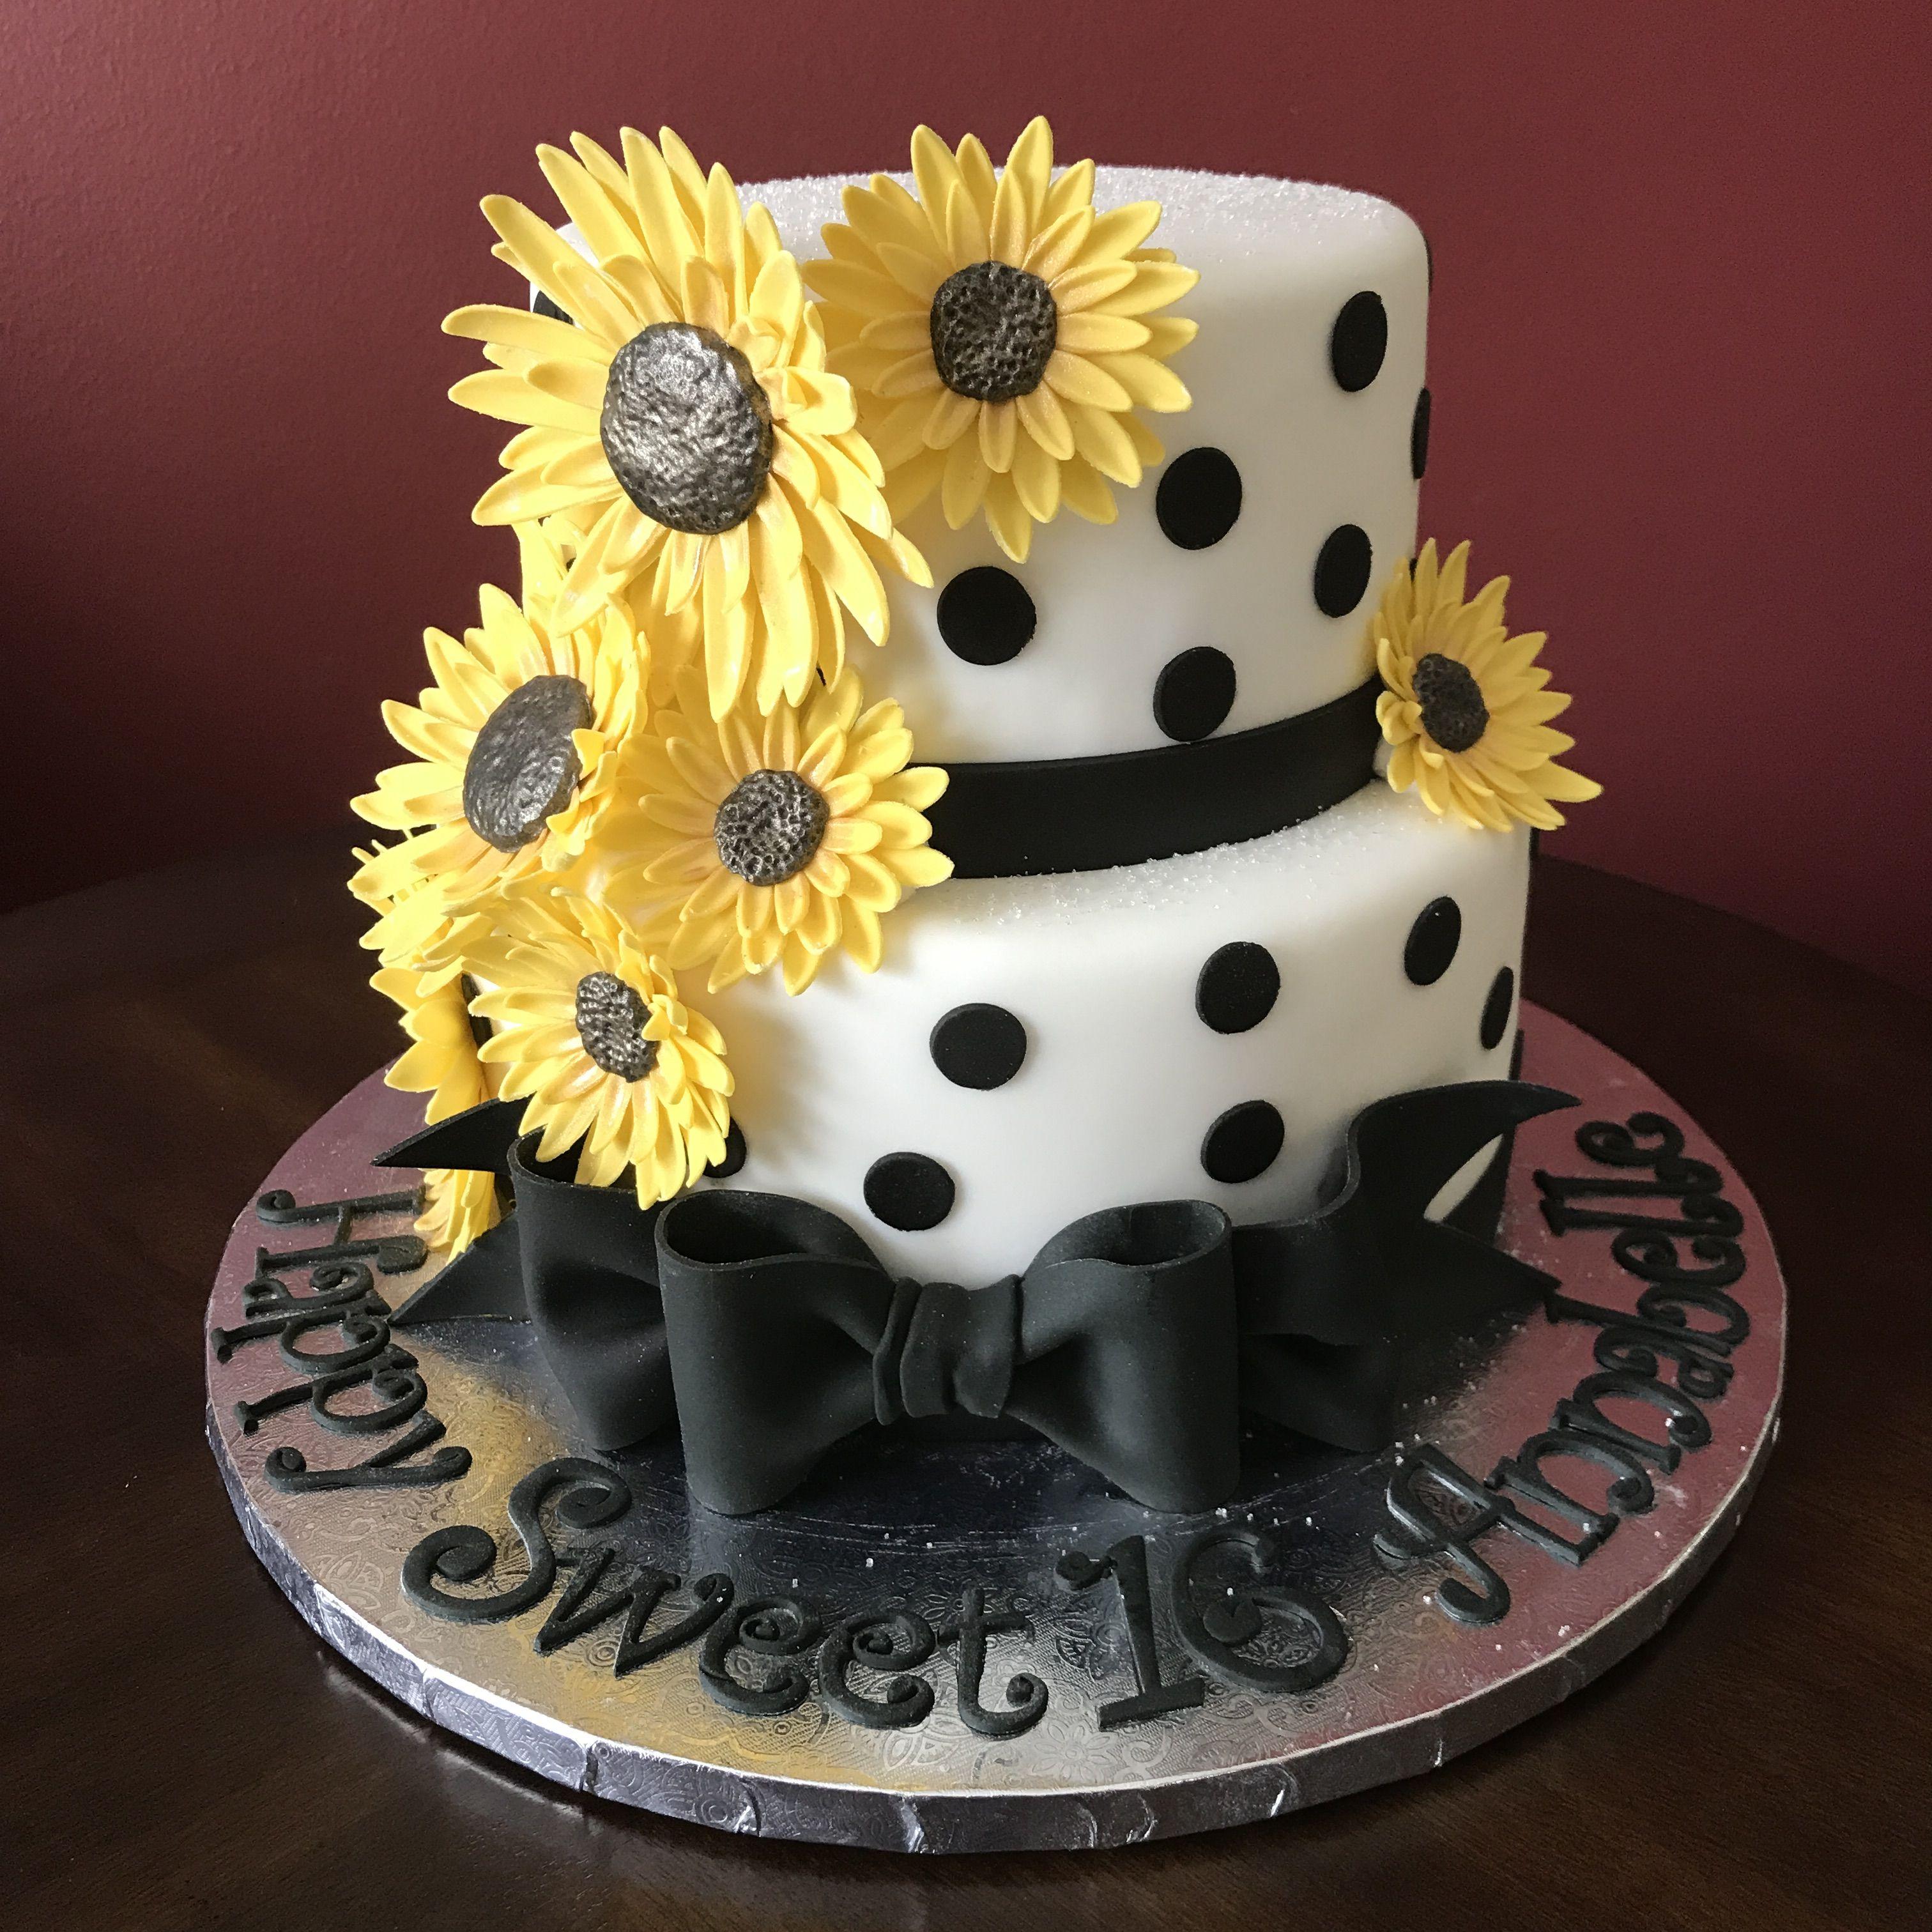 Sensational Sunflower Birthday Cake With Images Candy Birthday Cakes Funny Birthday Cards Online Necthendildamsfinfo